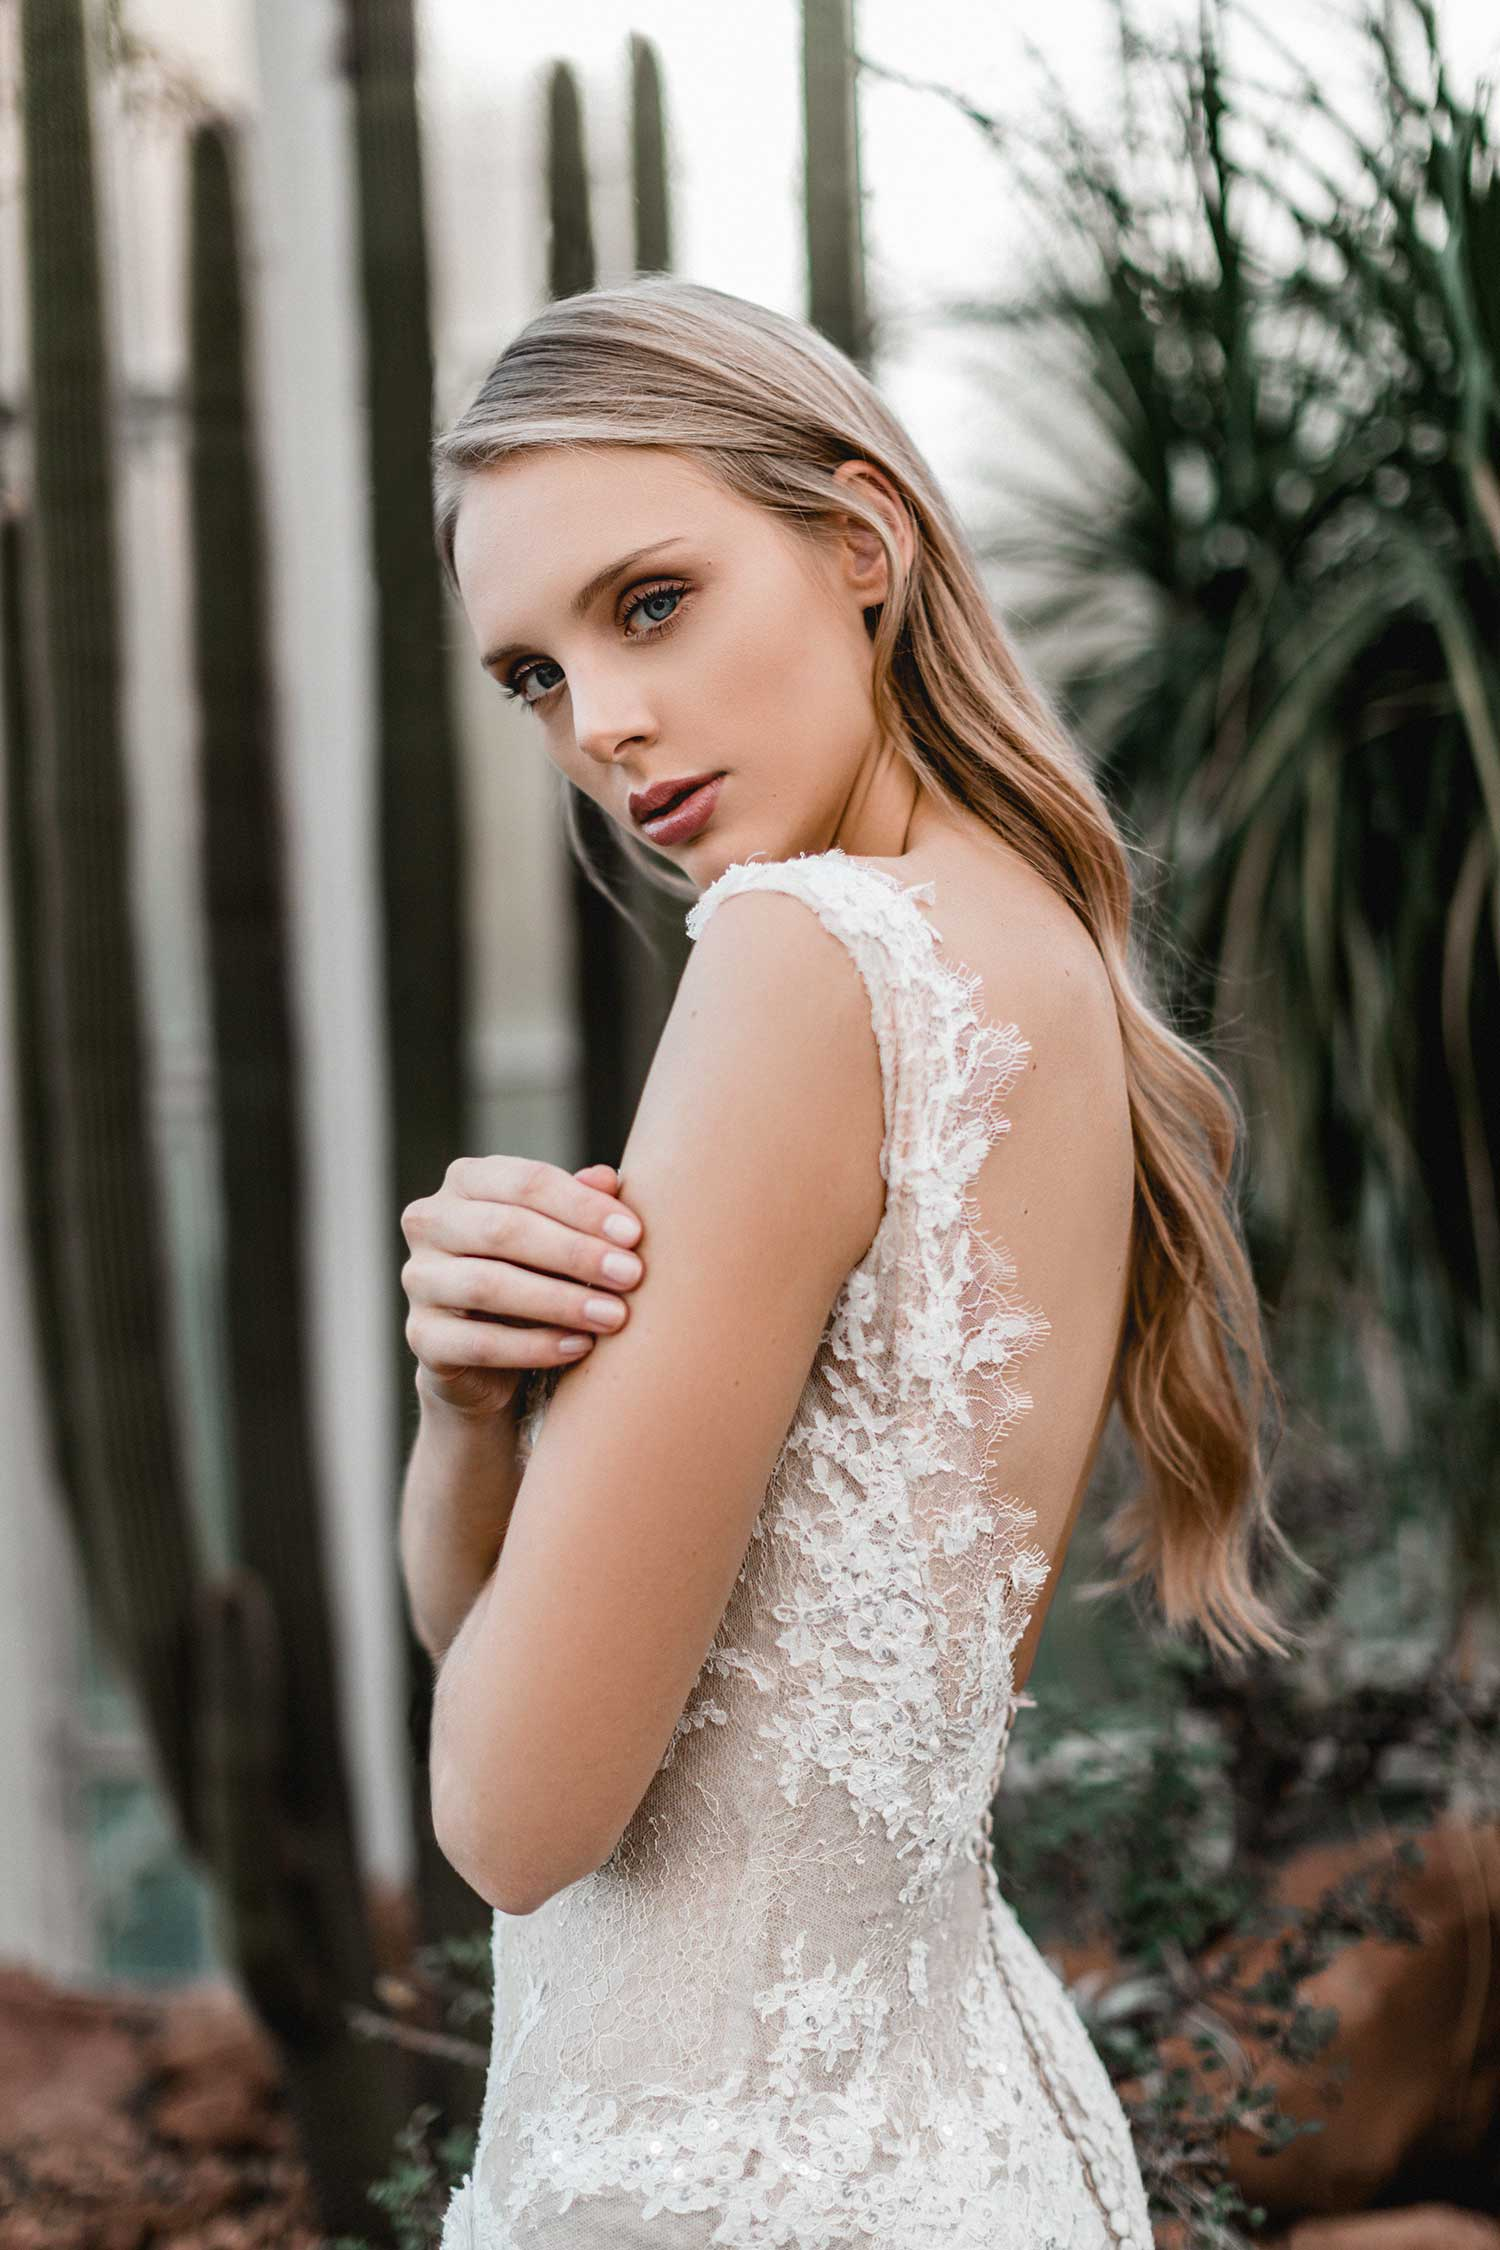 Bridal portrait in the Palmgarten